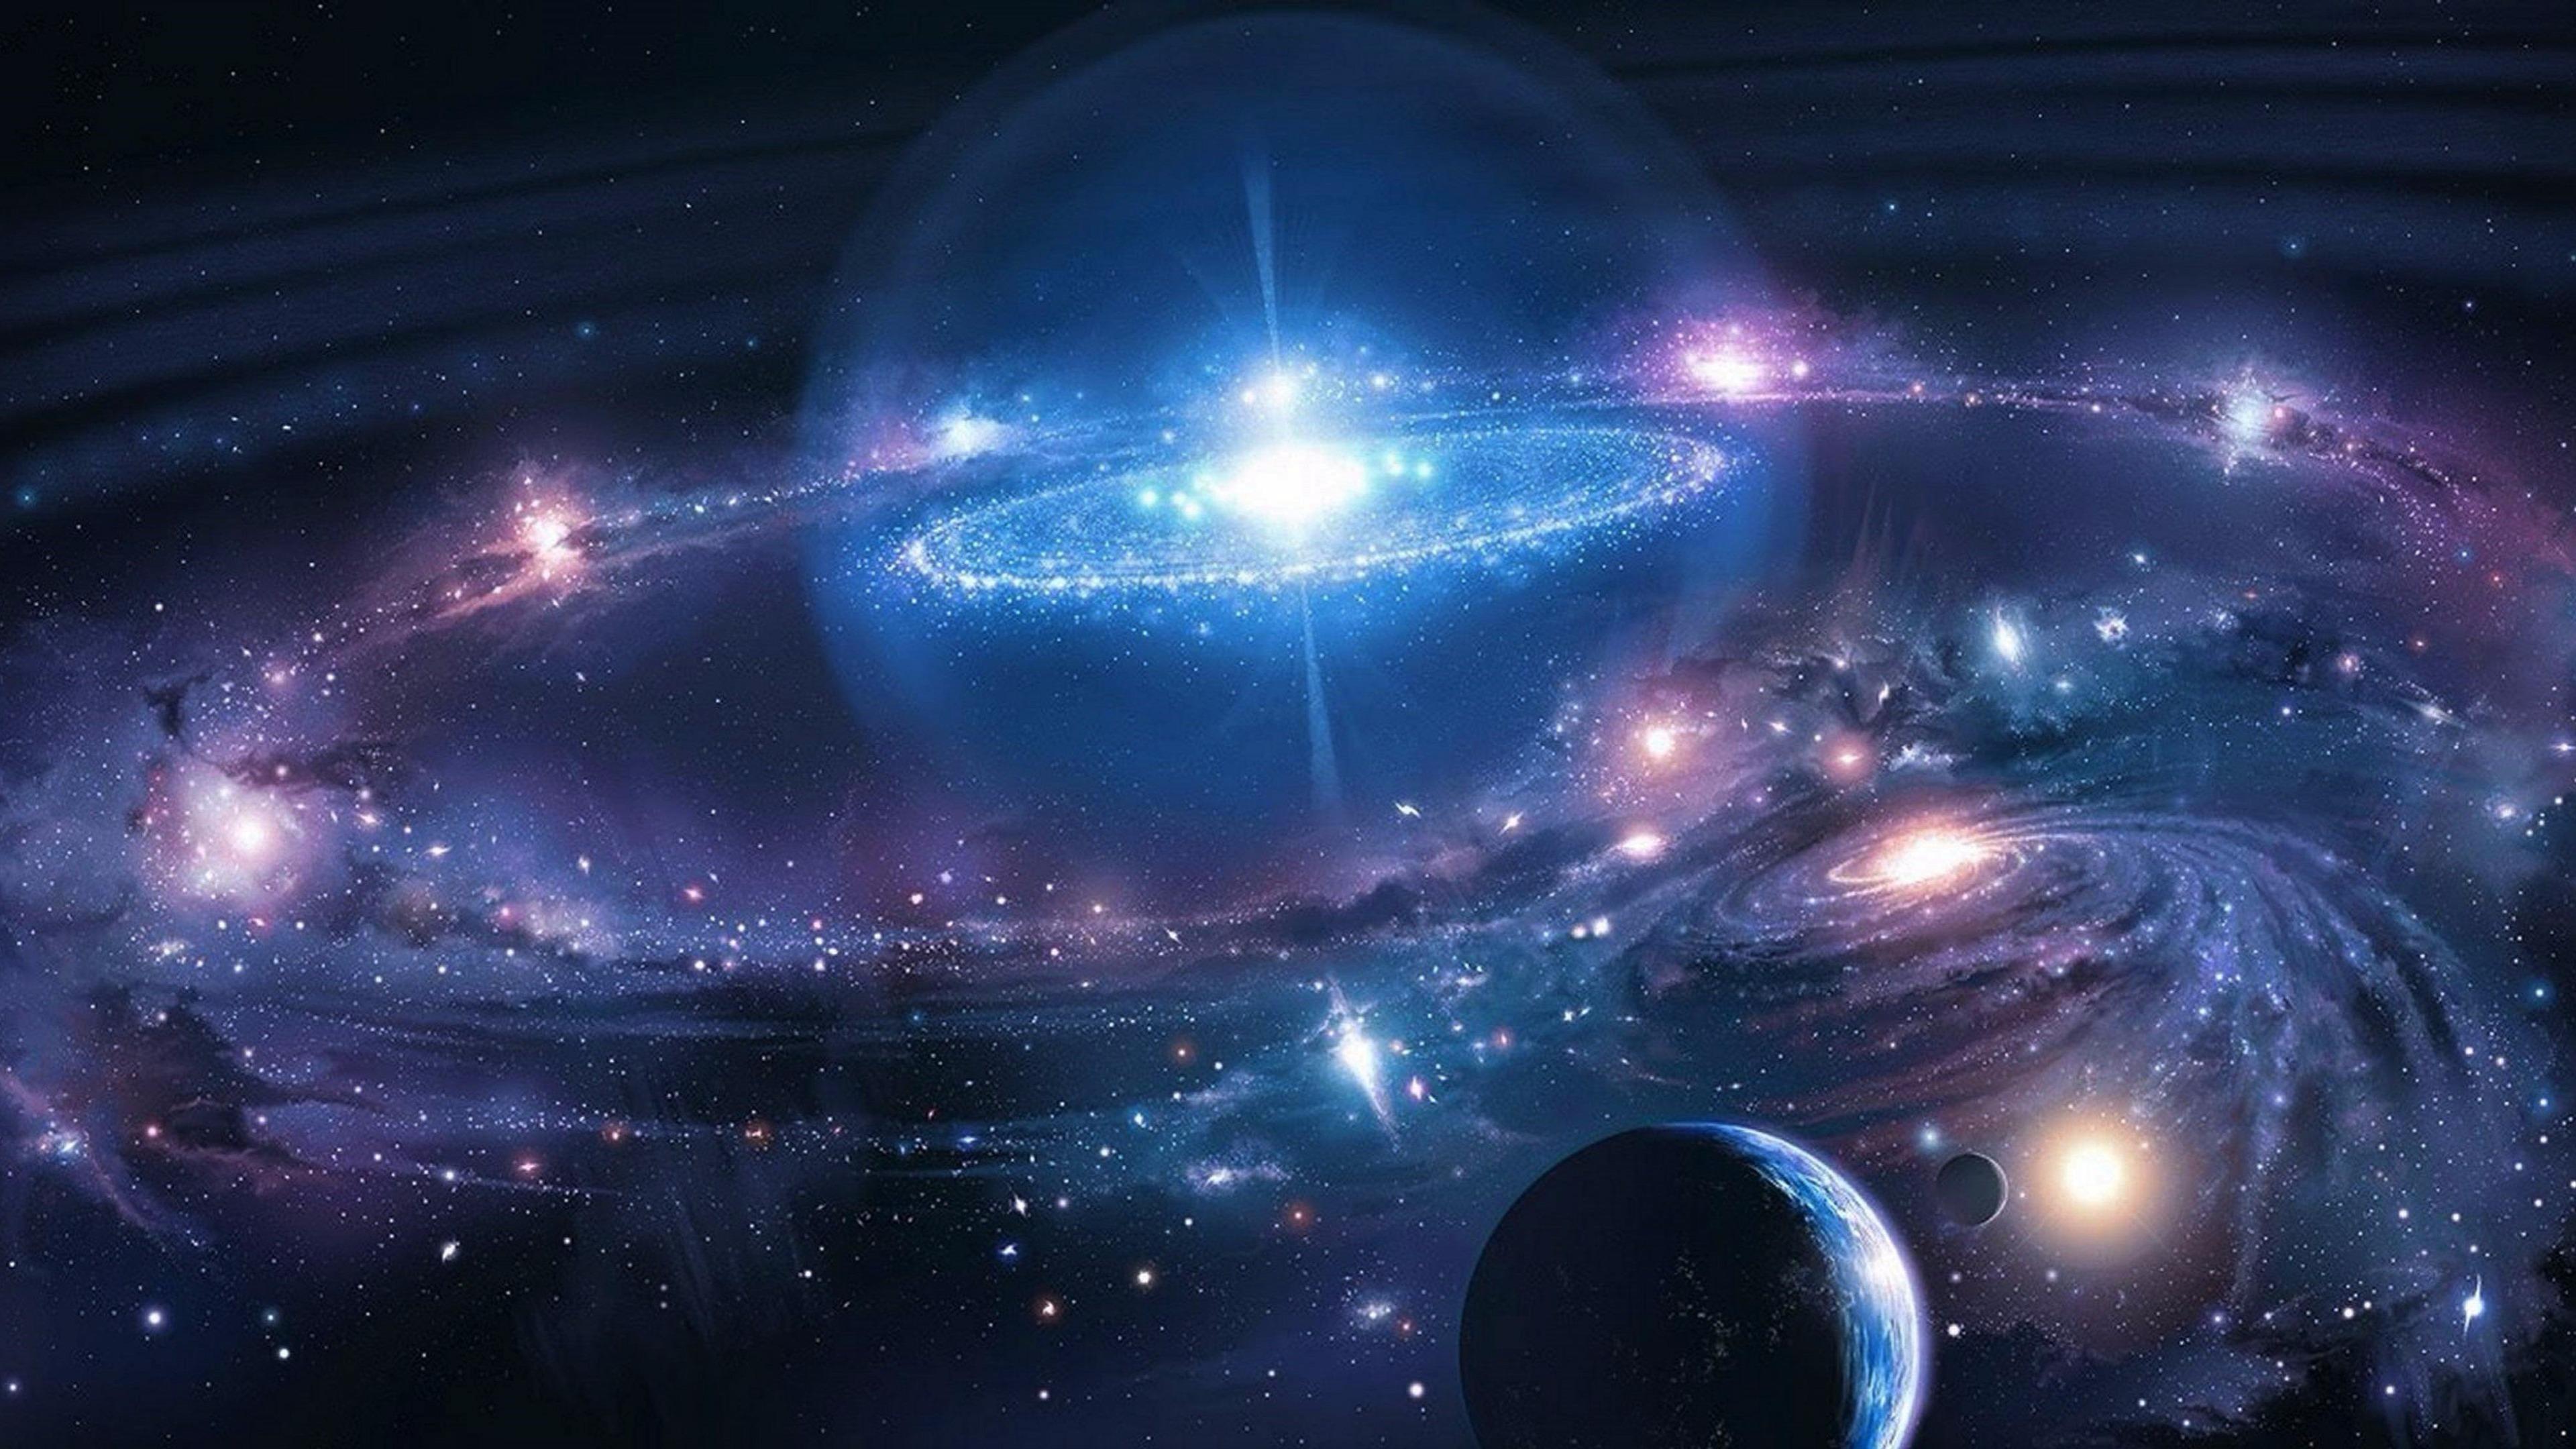 Hd Galaxy Wallpapers Top Free Hd Galaxy Backgrounds Wallpaperaccess